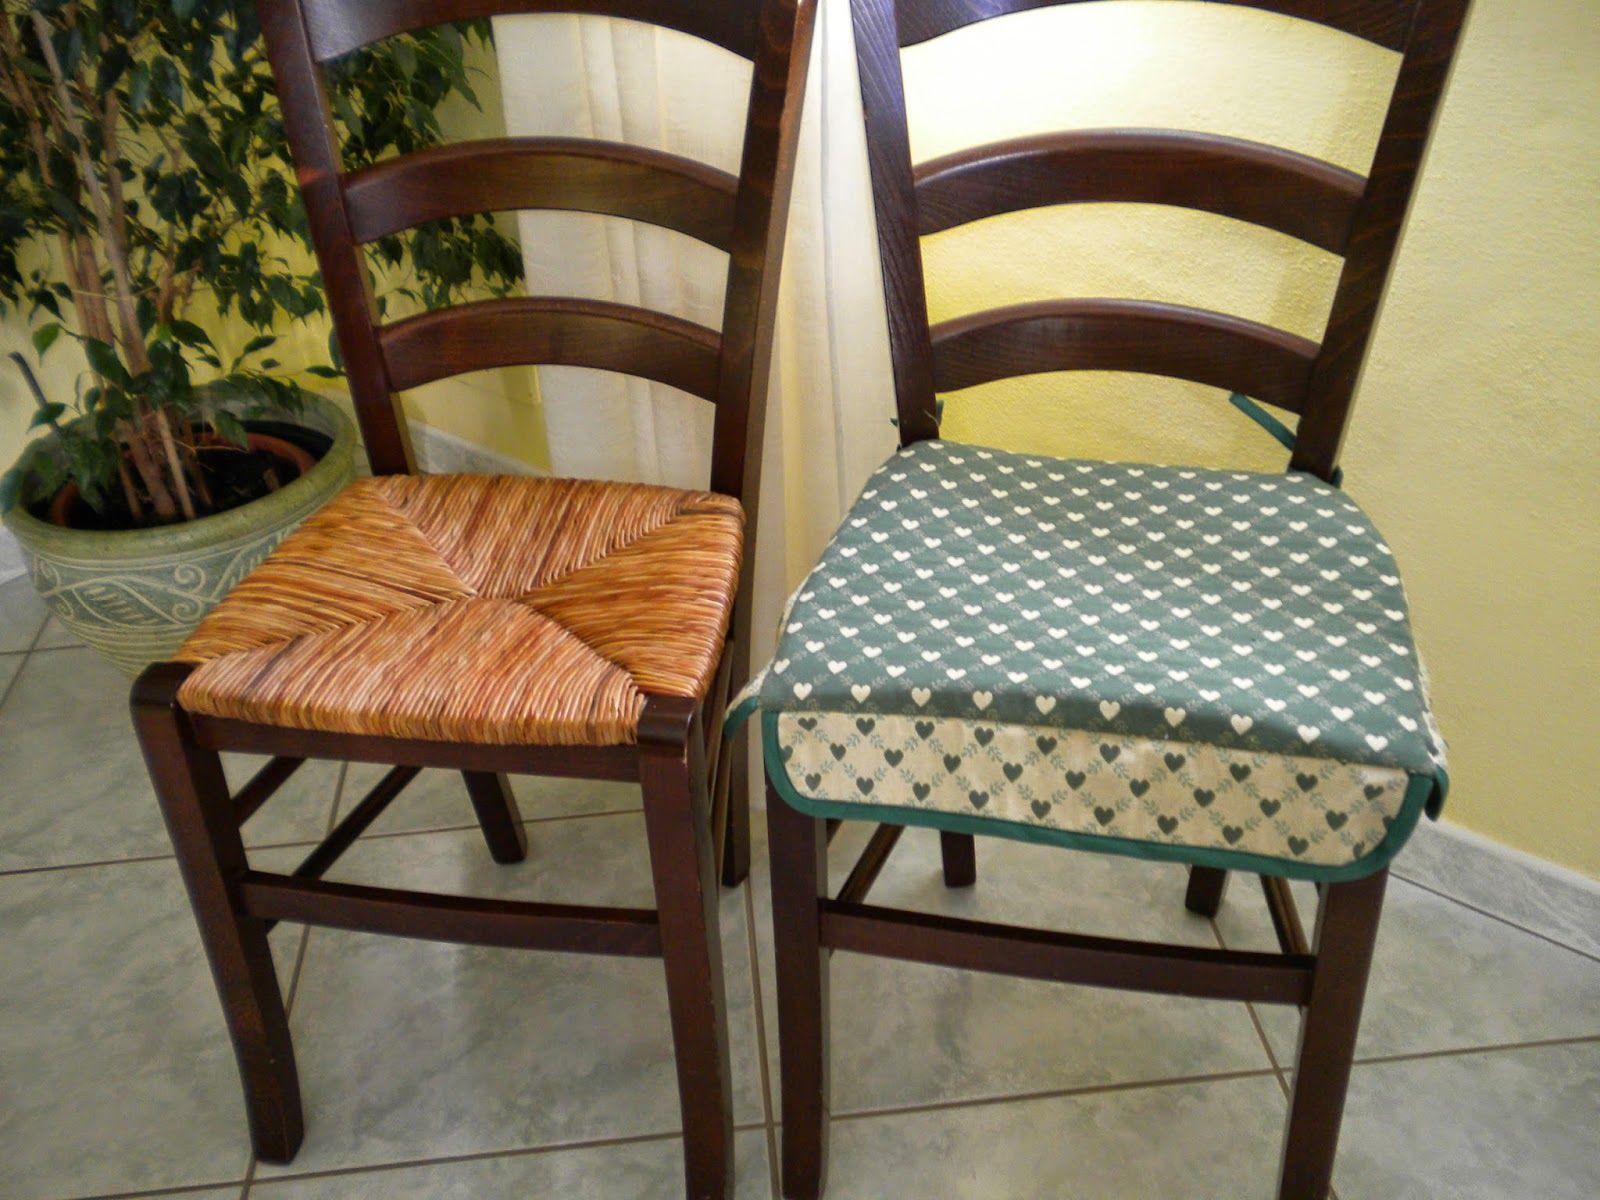 Cuscino per sedie Tutorial | Cuscini per sedia, Cuscini ...